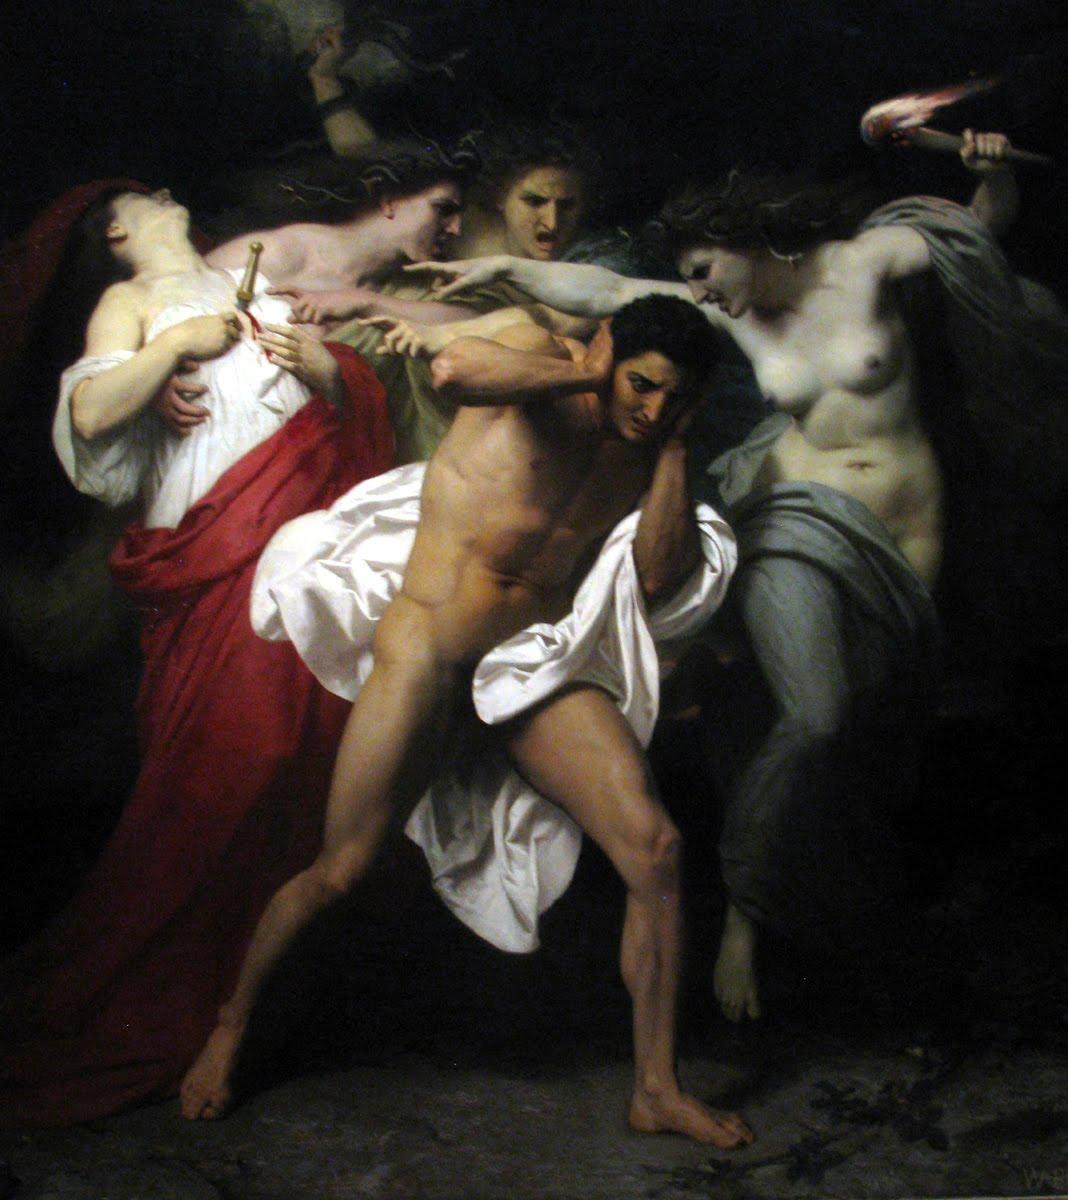 clytaemnestra's composure and orestes' regrets